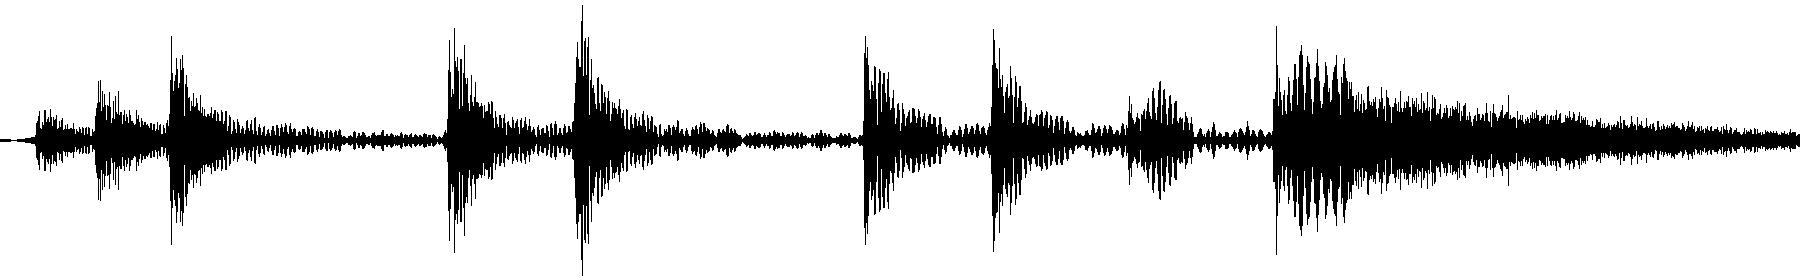 aretha franklin disco drum fill 130bpm